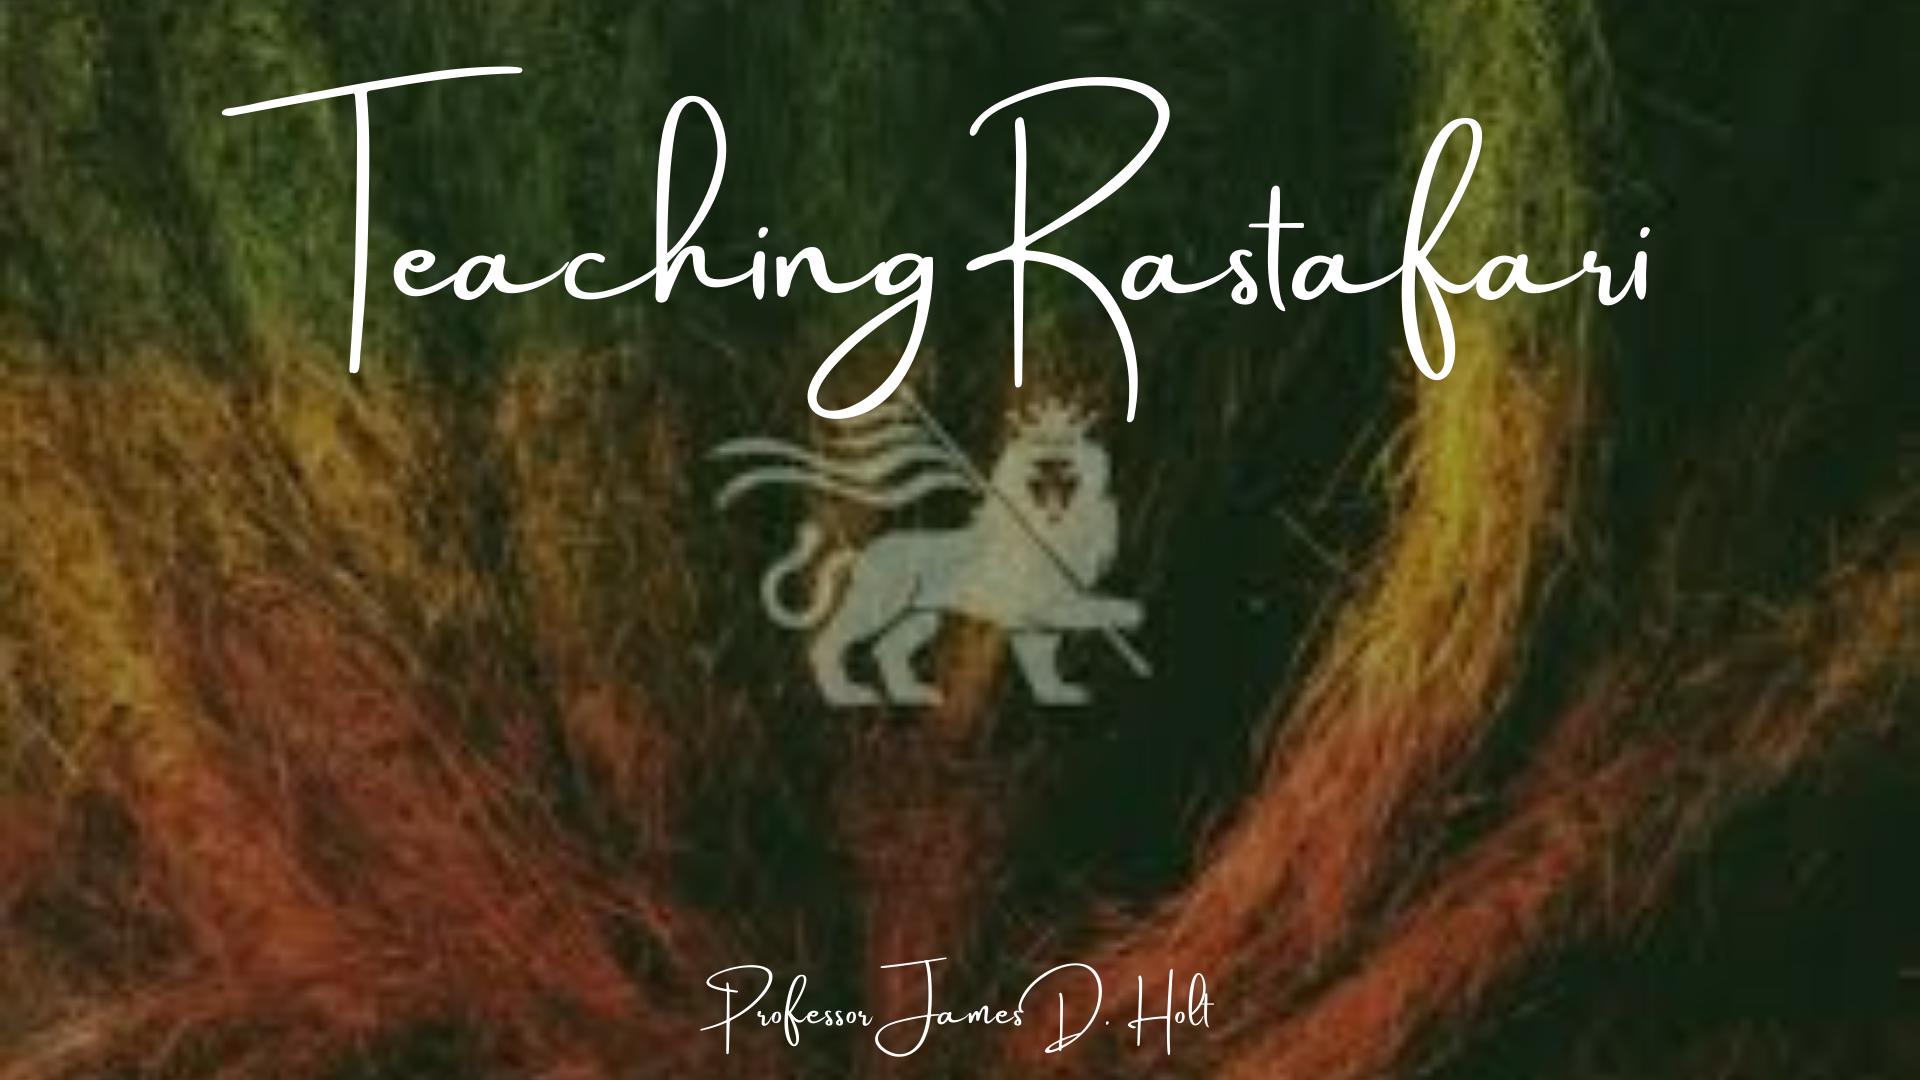 Teaching Rastafari